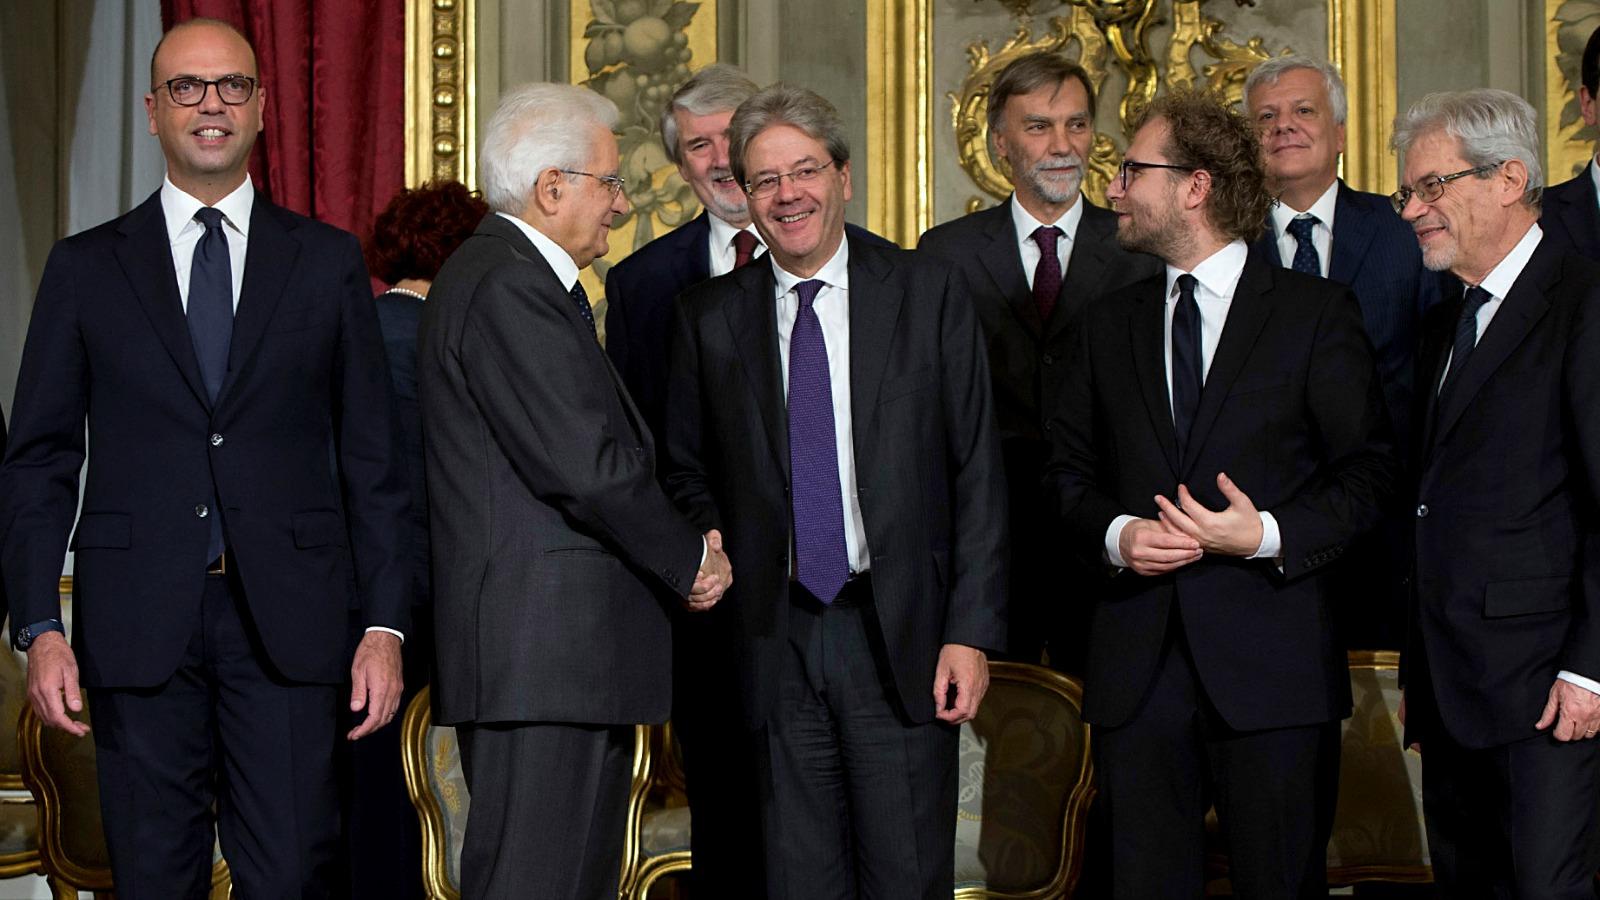 Gentiloni-cabinet-sworn-in